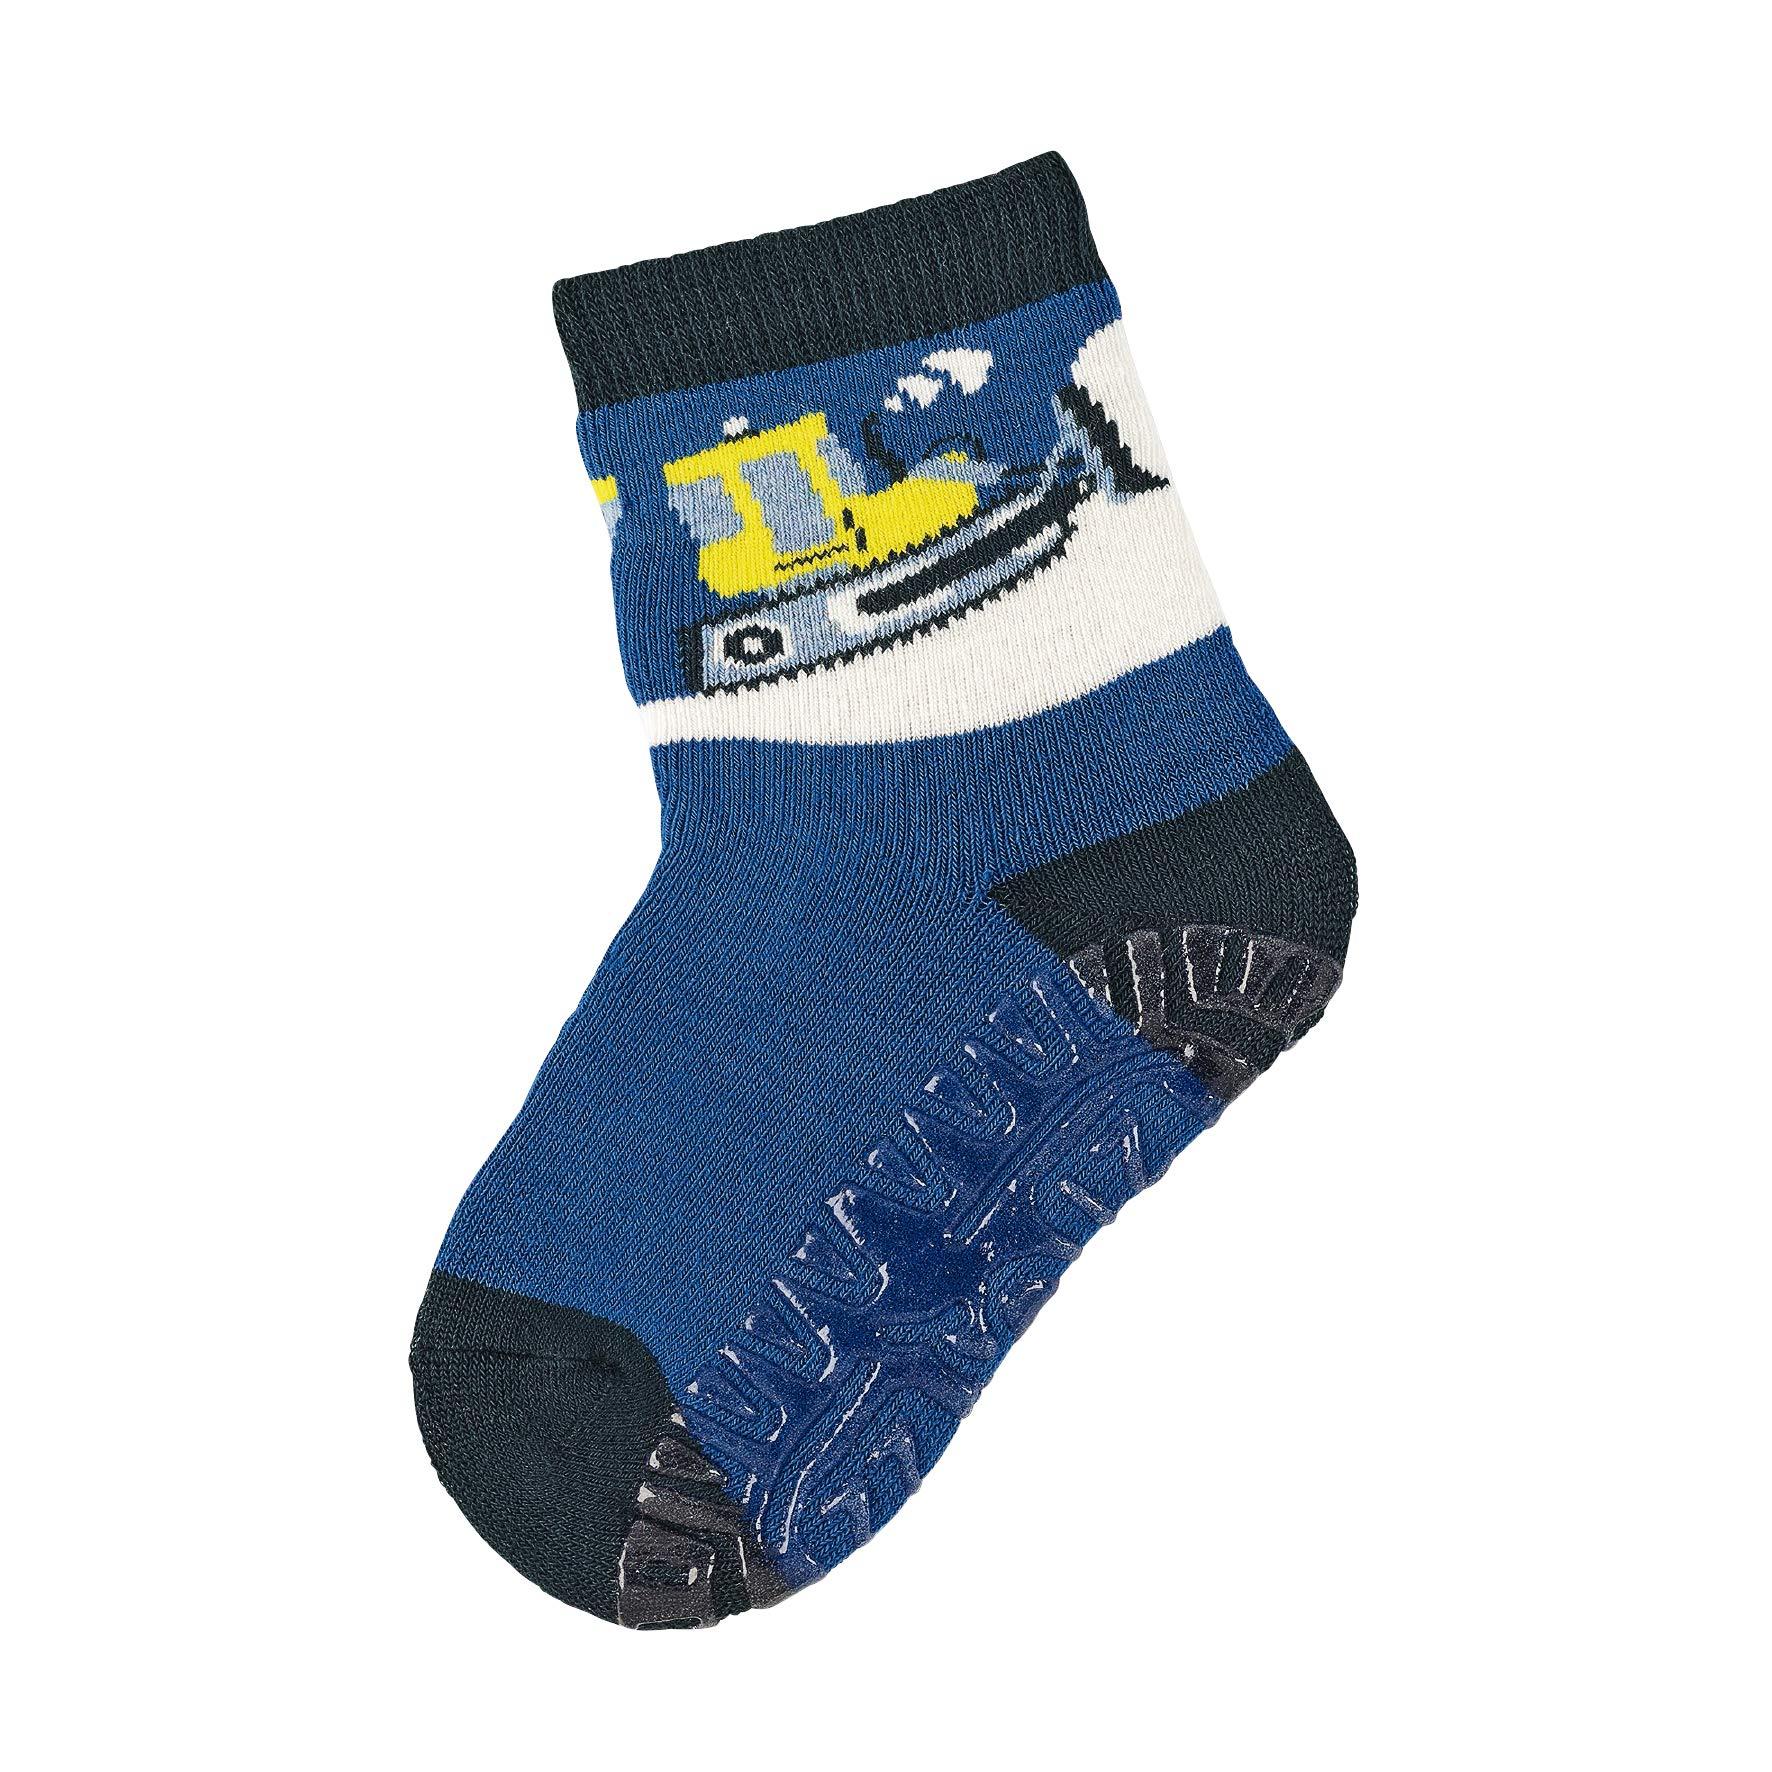 Sterntaler Newborn Socks Calcetines para Beb/és